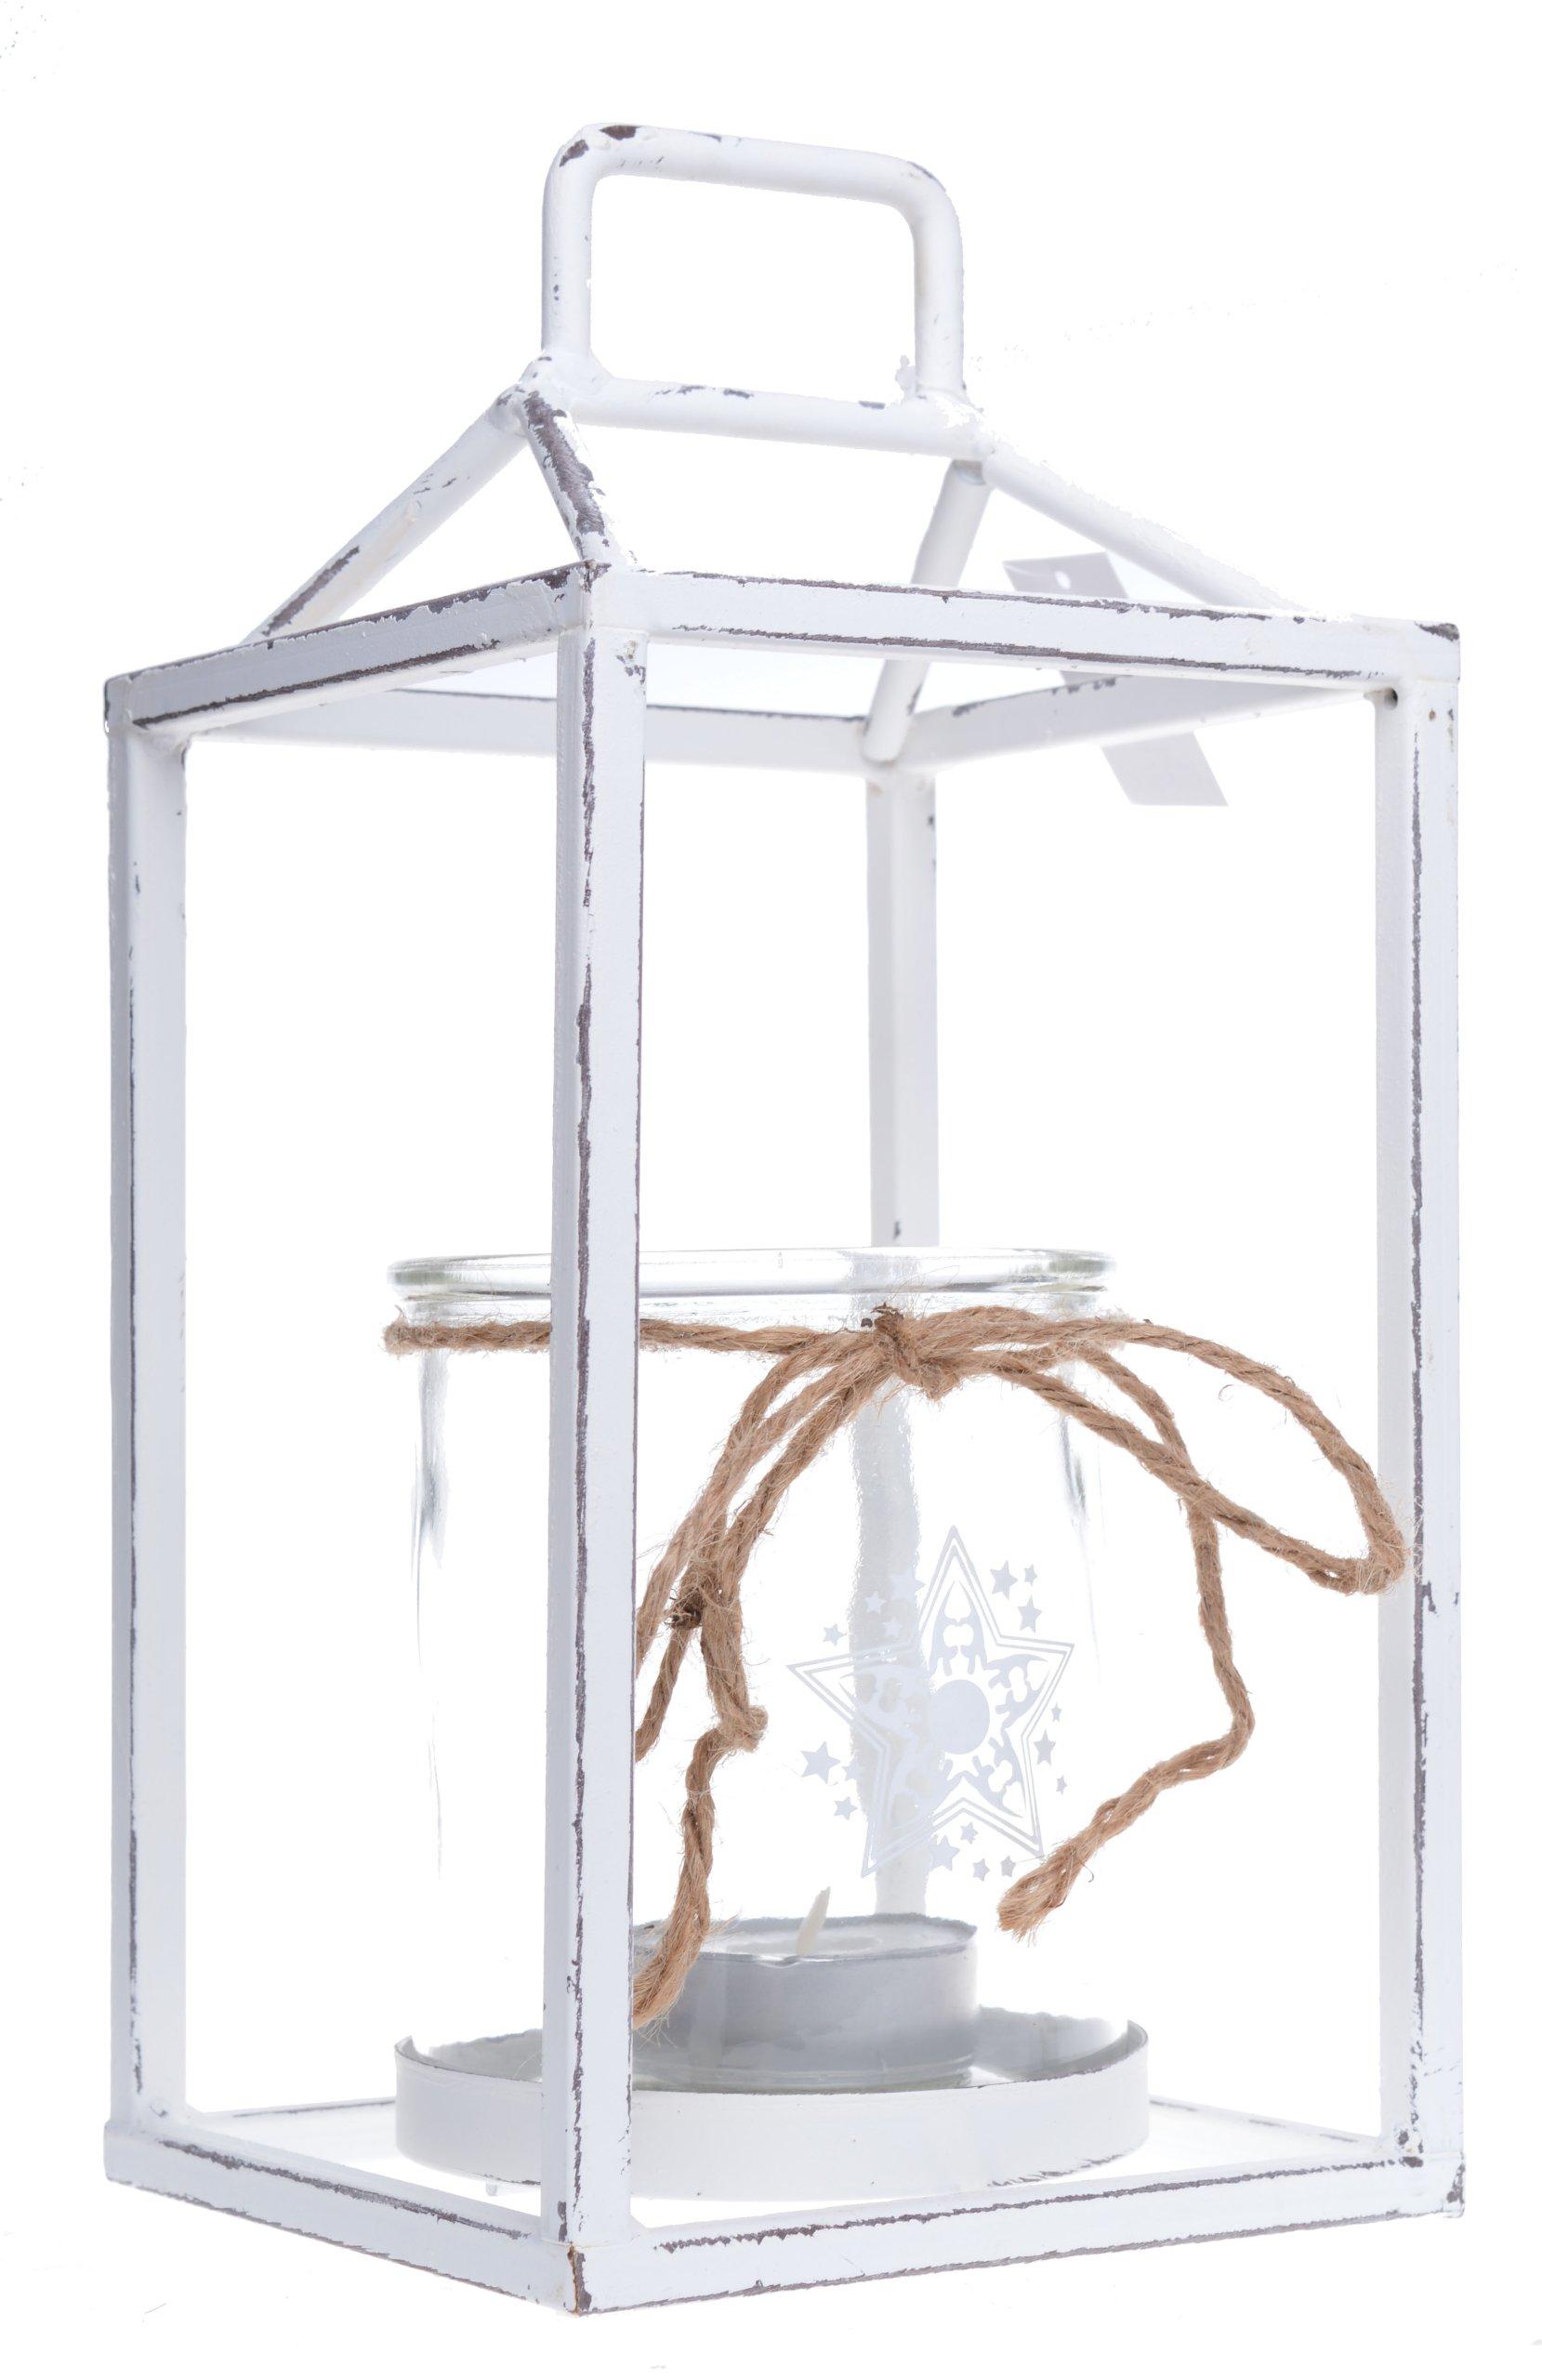 Lantern Lighthouse Dovolenka Dekorácie Svadba 228Biel